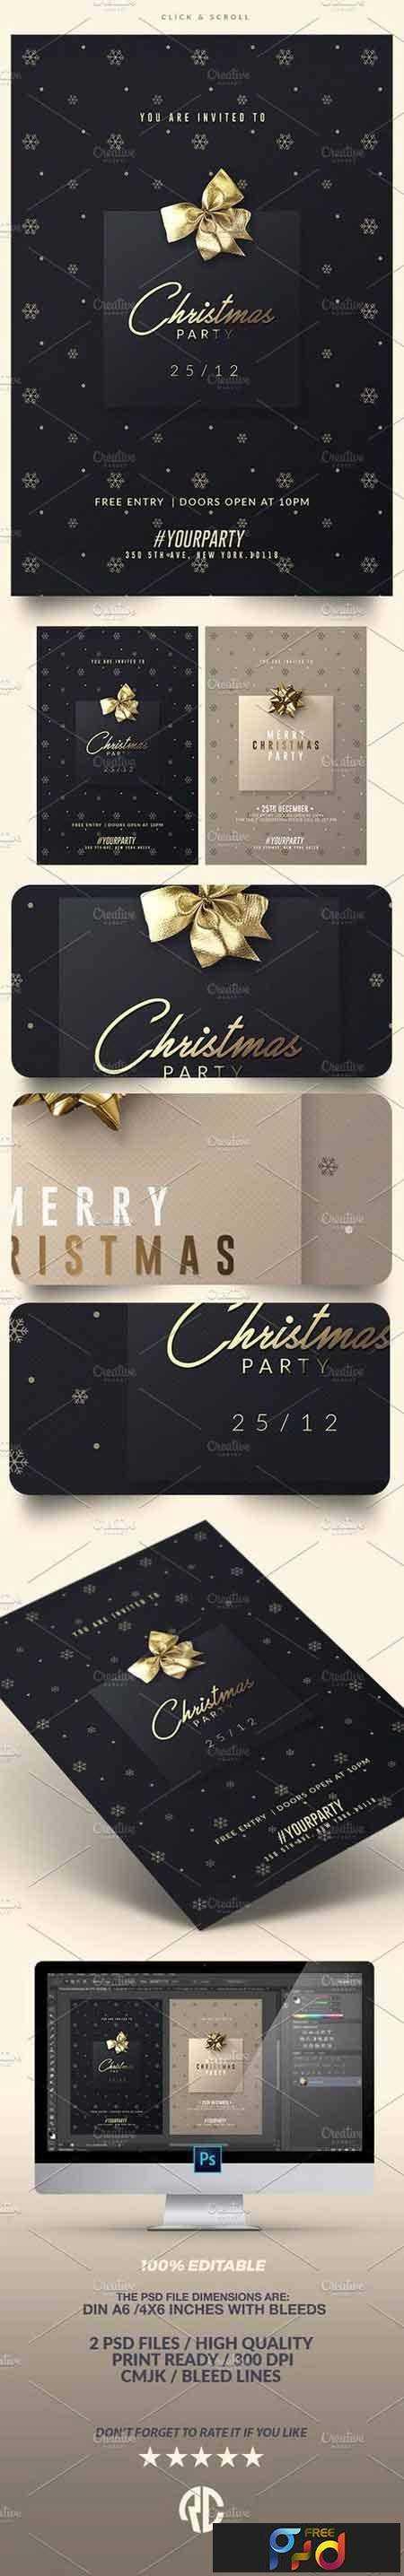 freepsdvn-com_1480554785_2-classy-christmas-psd-invitations-1034548